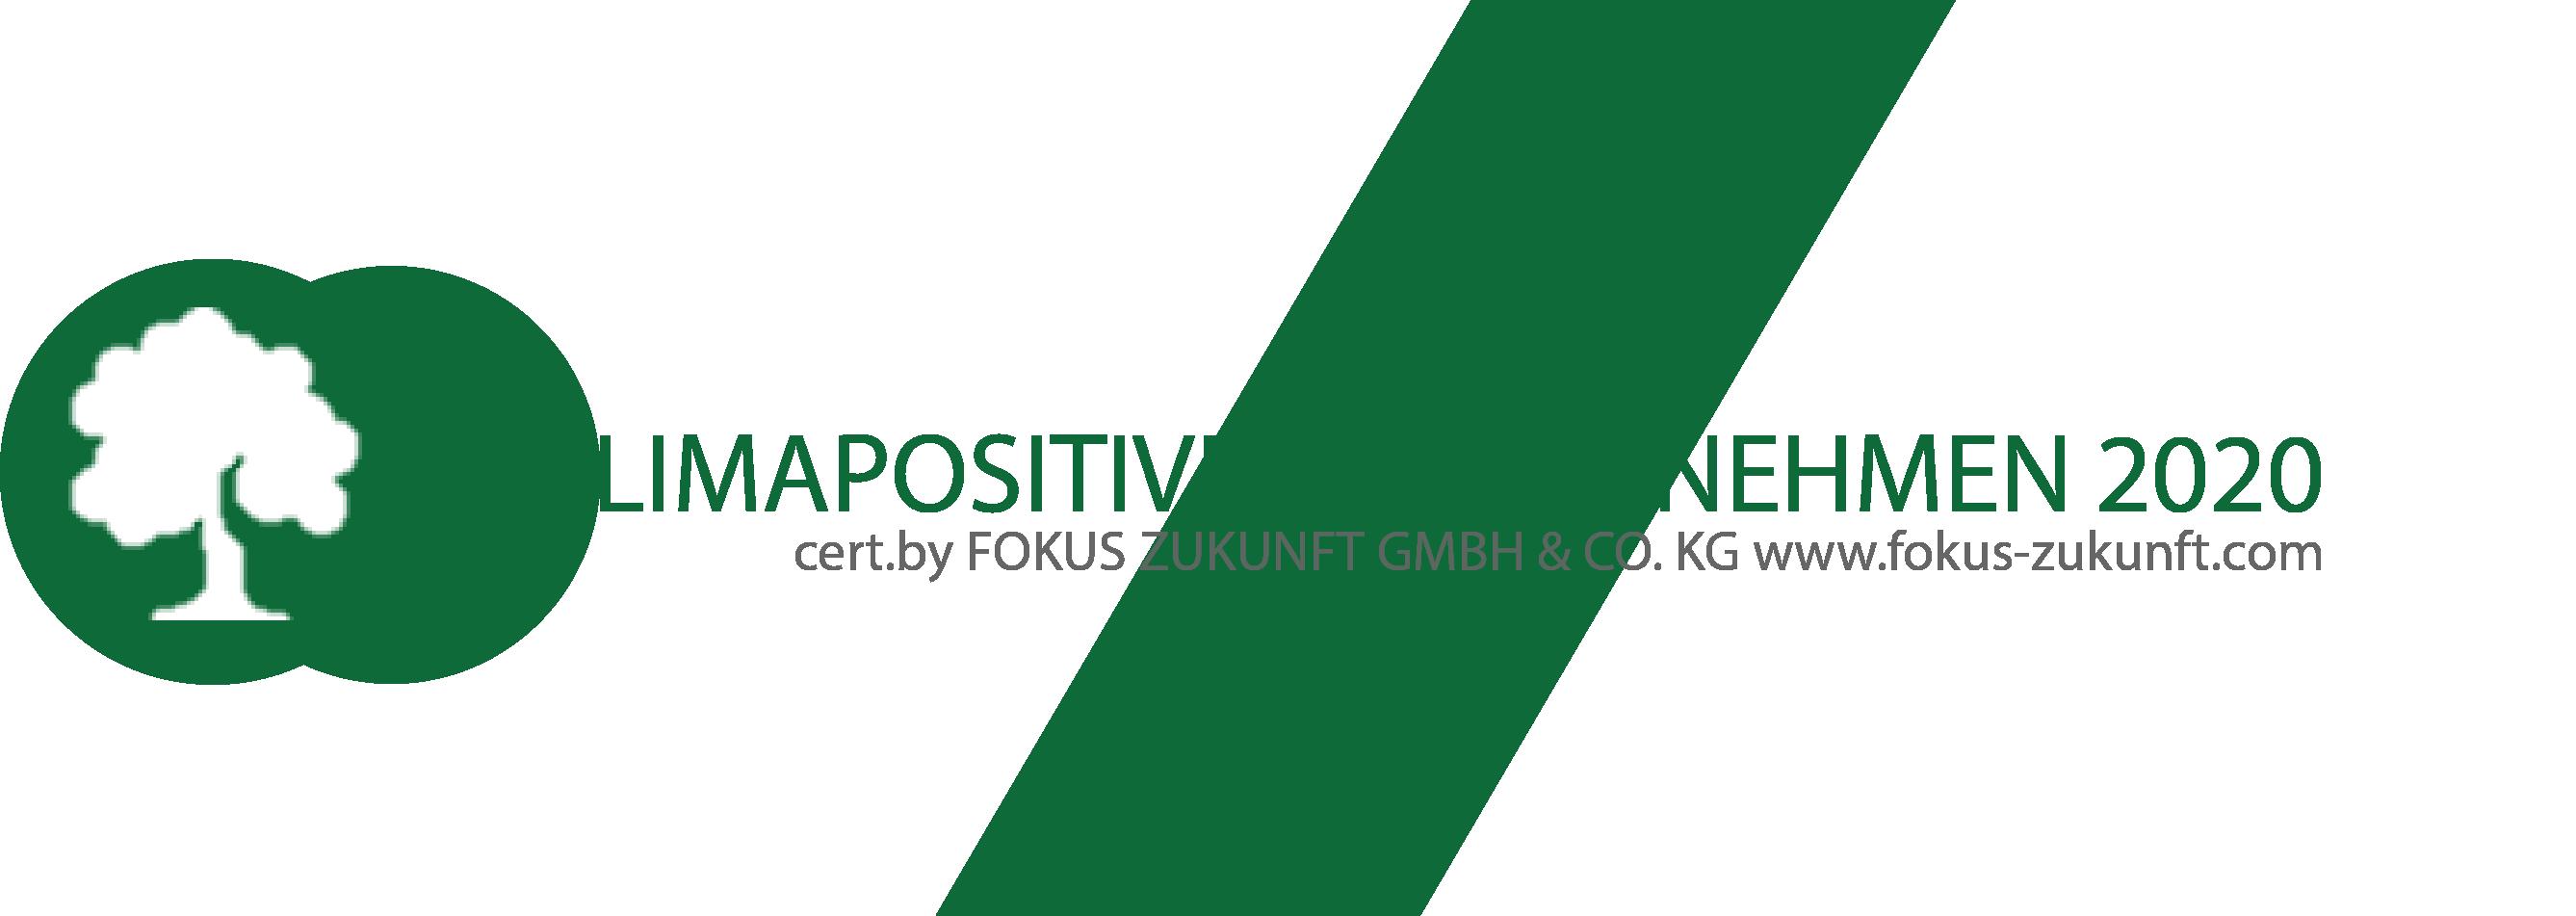 signatur_lang_unternehmen_2020_positiv